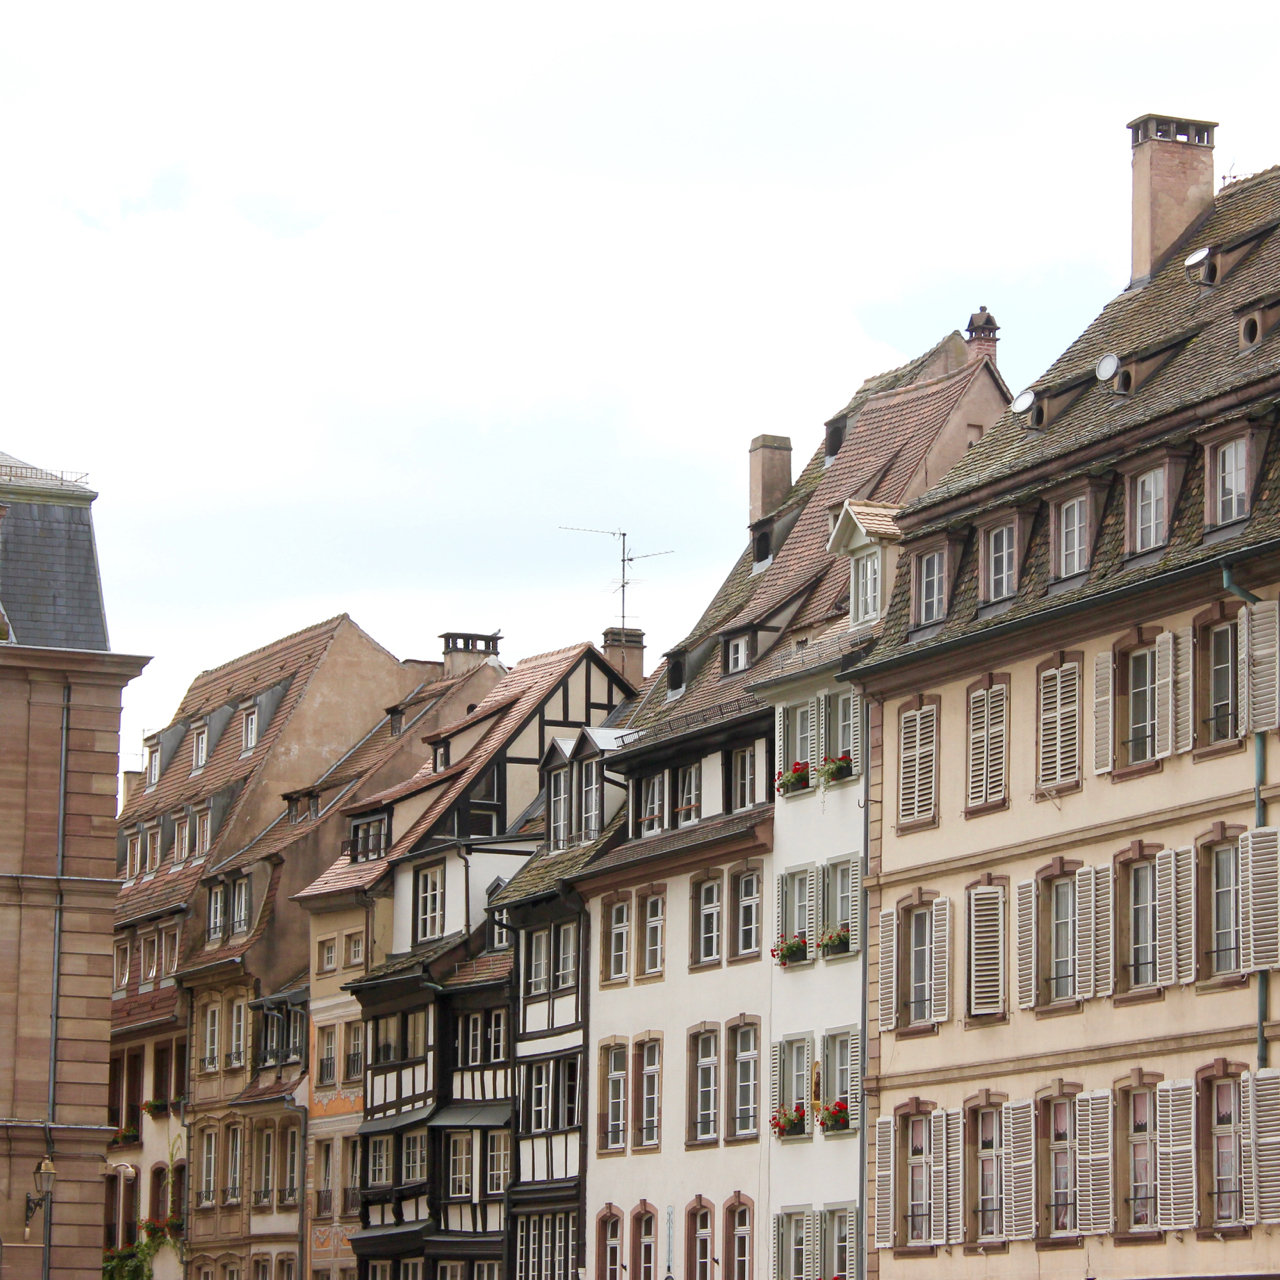 Strasbourg, France - 6